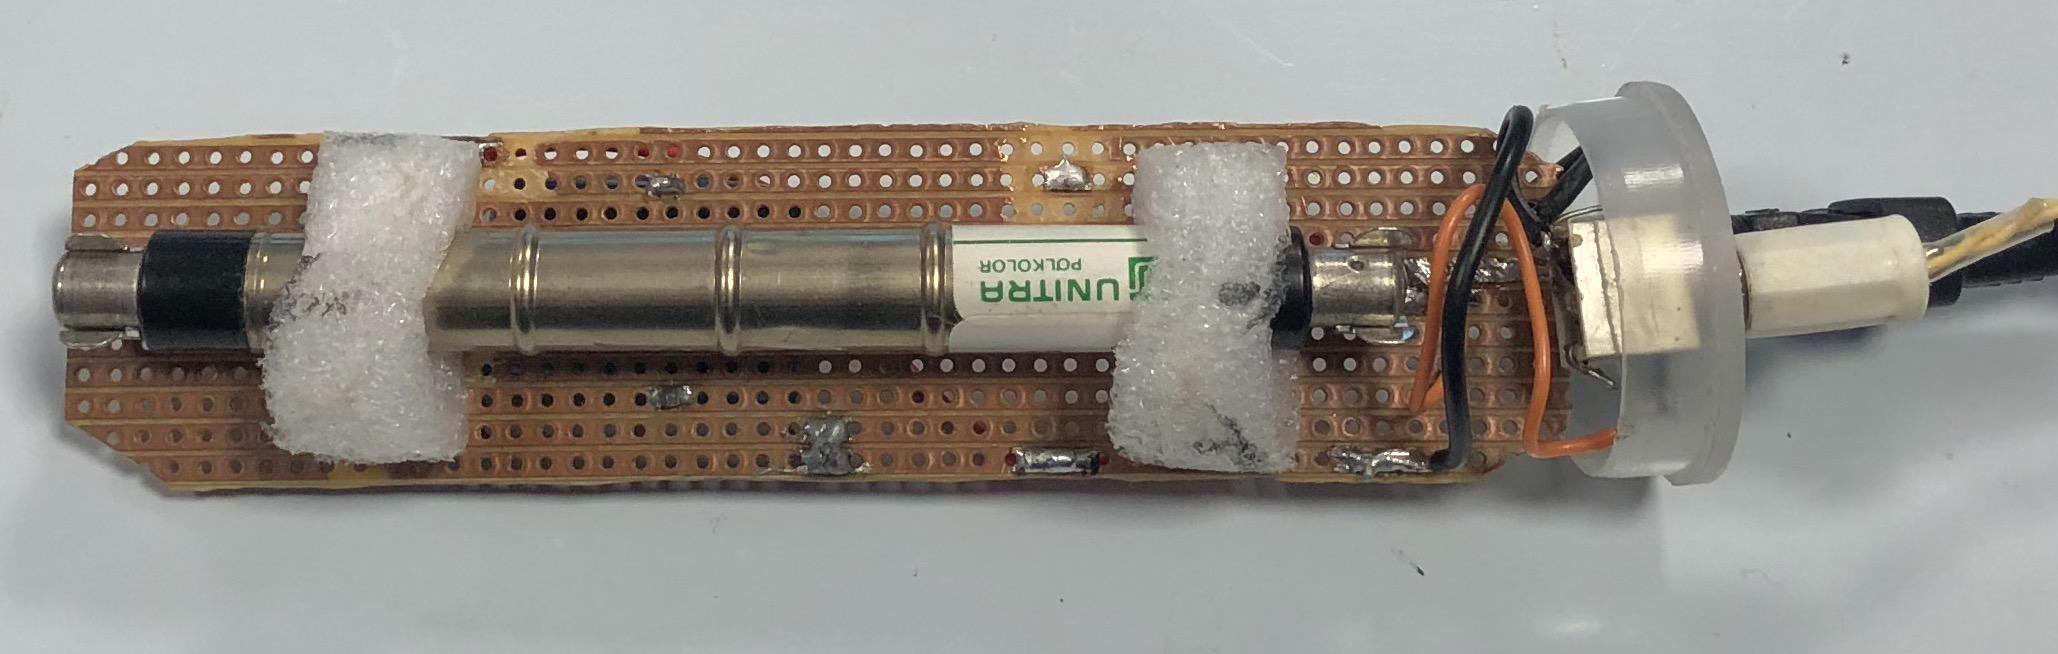 Circuits Nomades Captu269